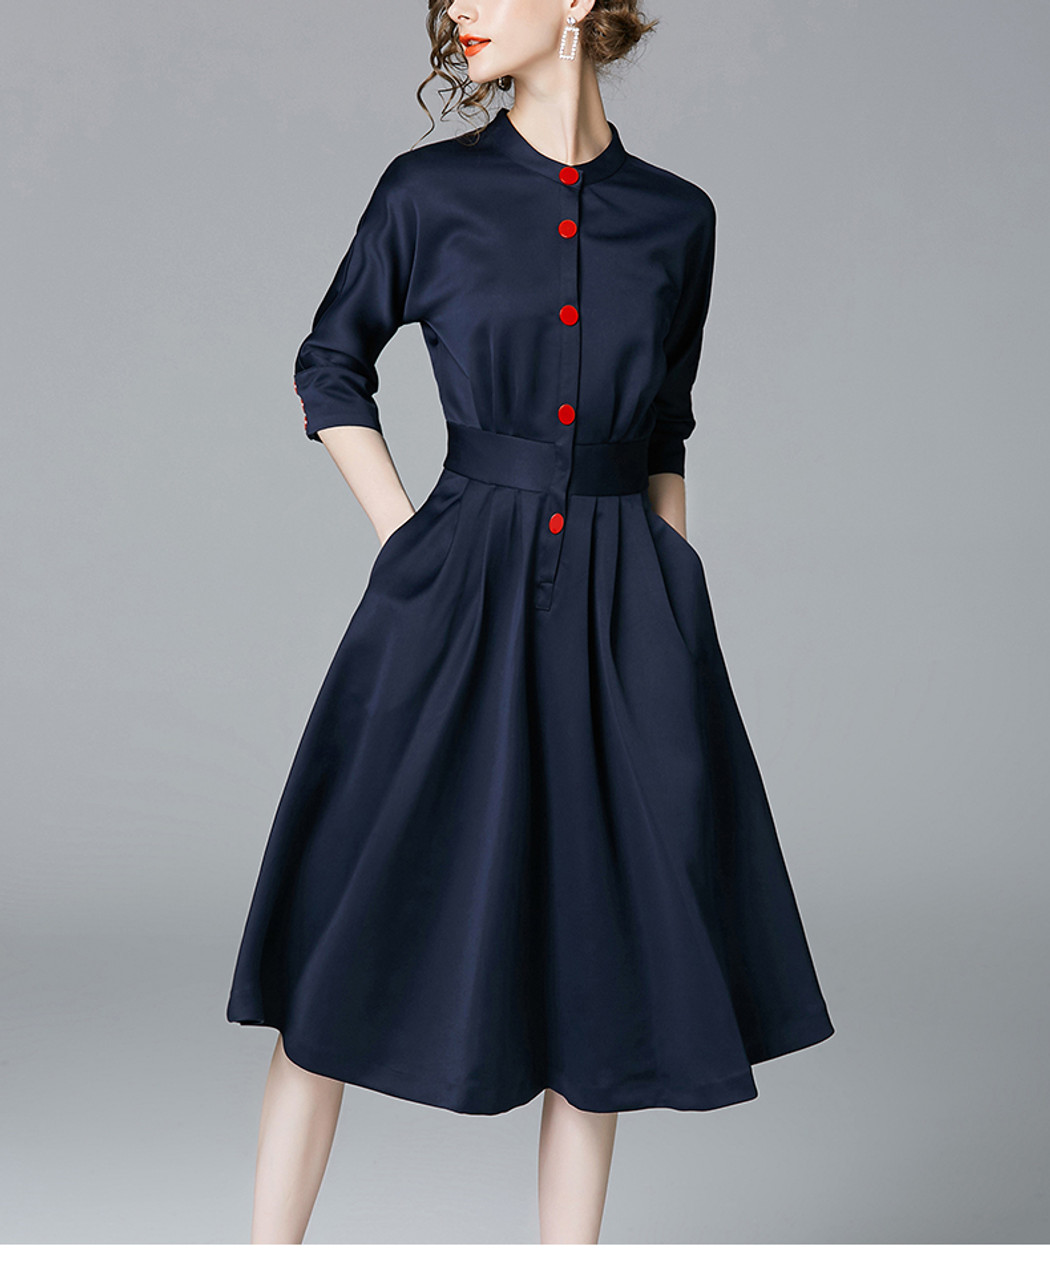 35cb2b3f2c5 ... New Spring Autumn Vintage Dresses Women Slim 3 4 Sleeve A Line Office Wear  Dress ...